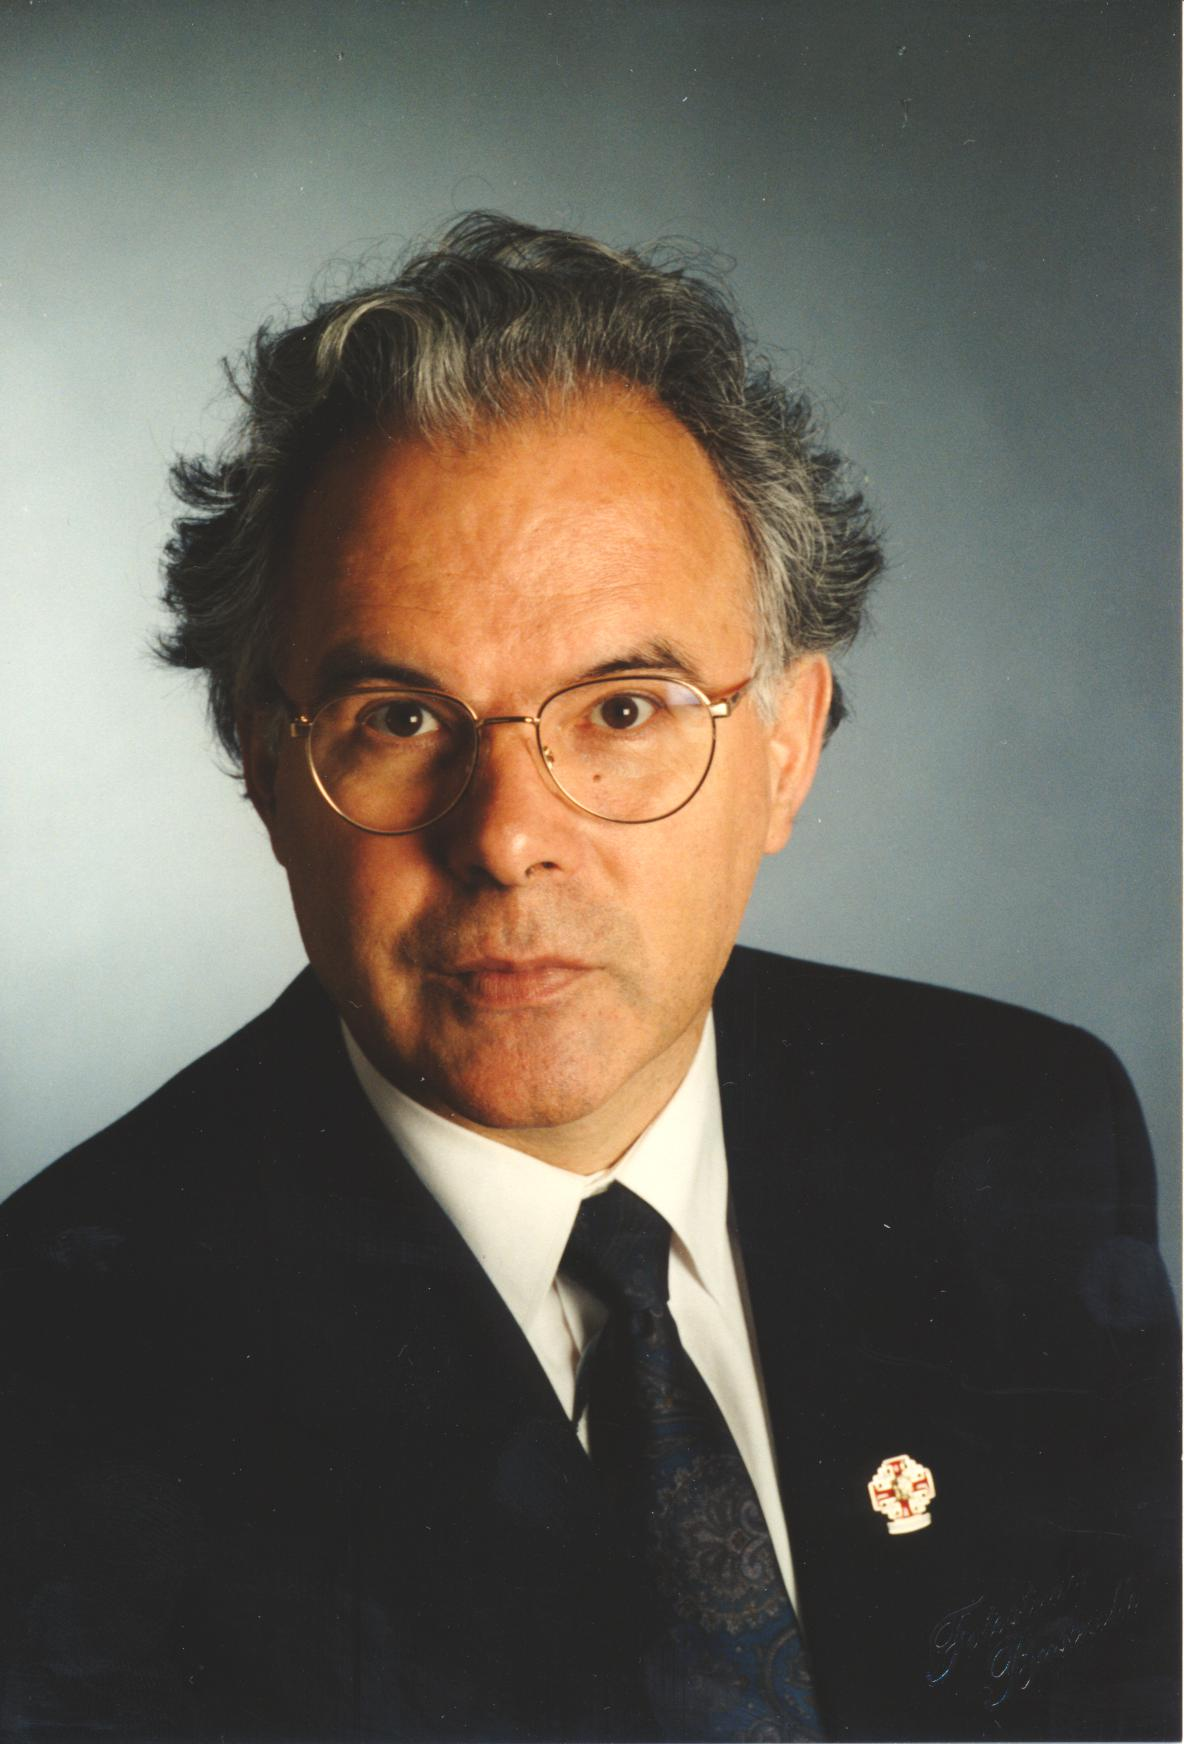 XV. Imago Mundi-Kongress 1995, Innsbruck, Prof. Dr. Dr. Andreas Resch